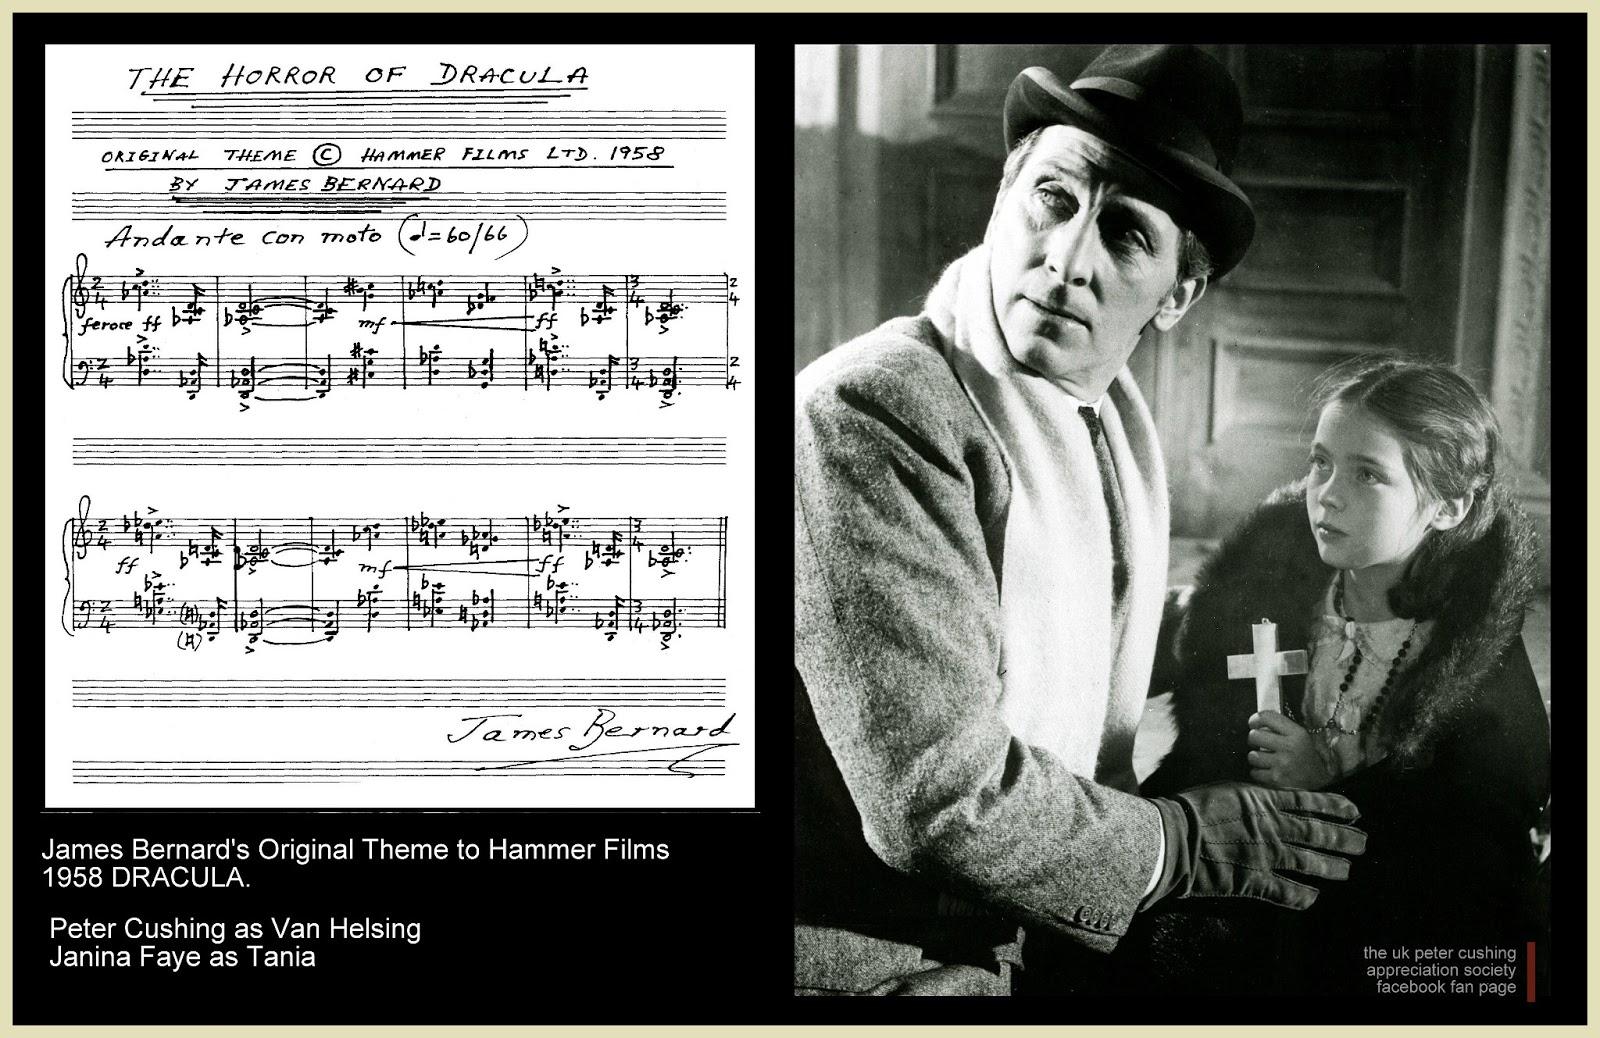 The Black Box Club: JAMES BERNARD'S ORIGINAL THEME TO HAMMER